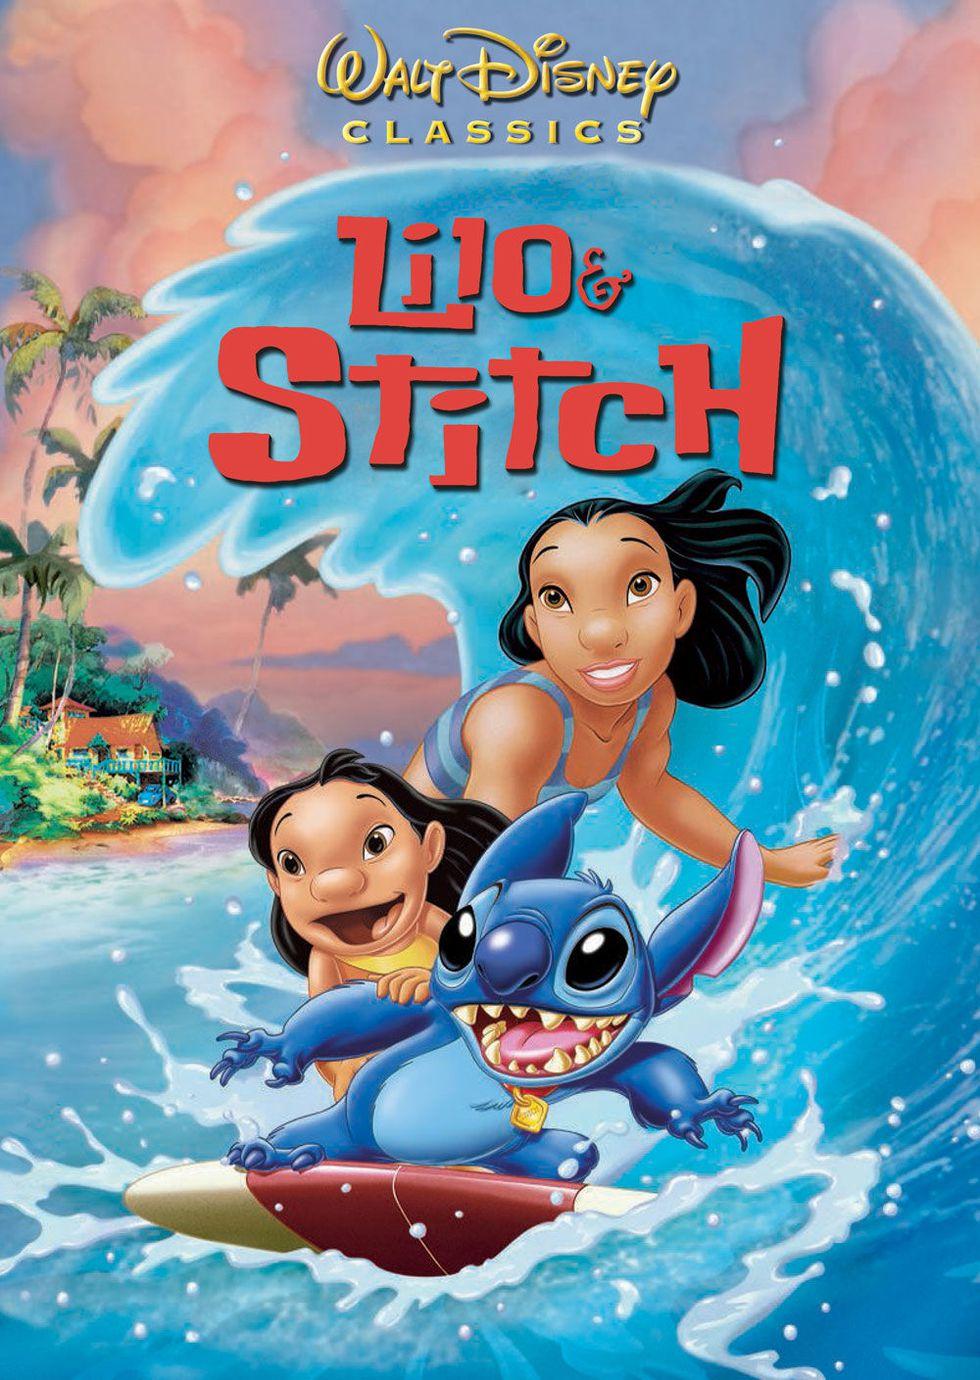 lilo-and-stitch-movie-poster-1538602091.jpg